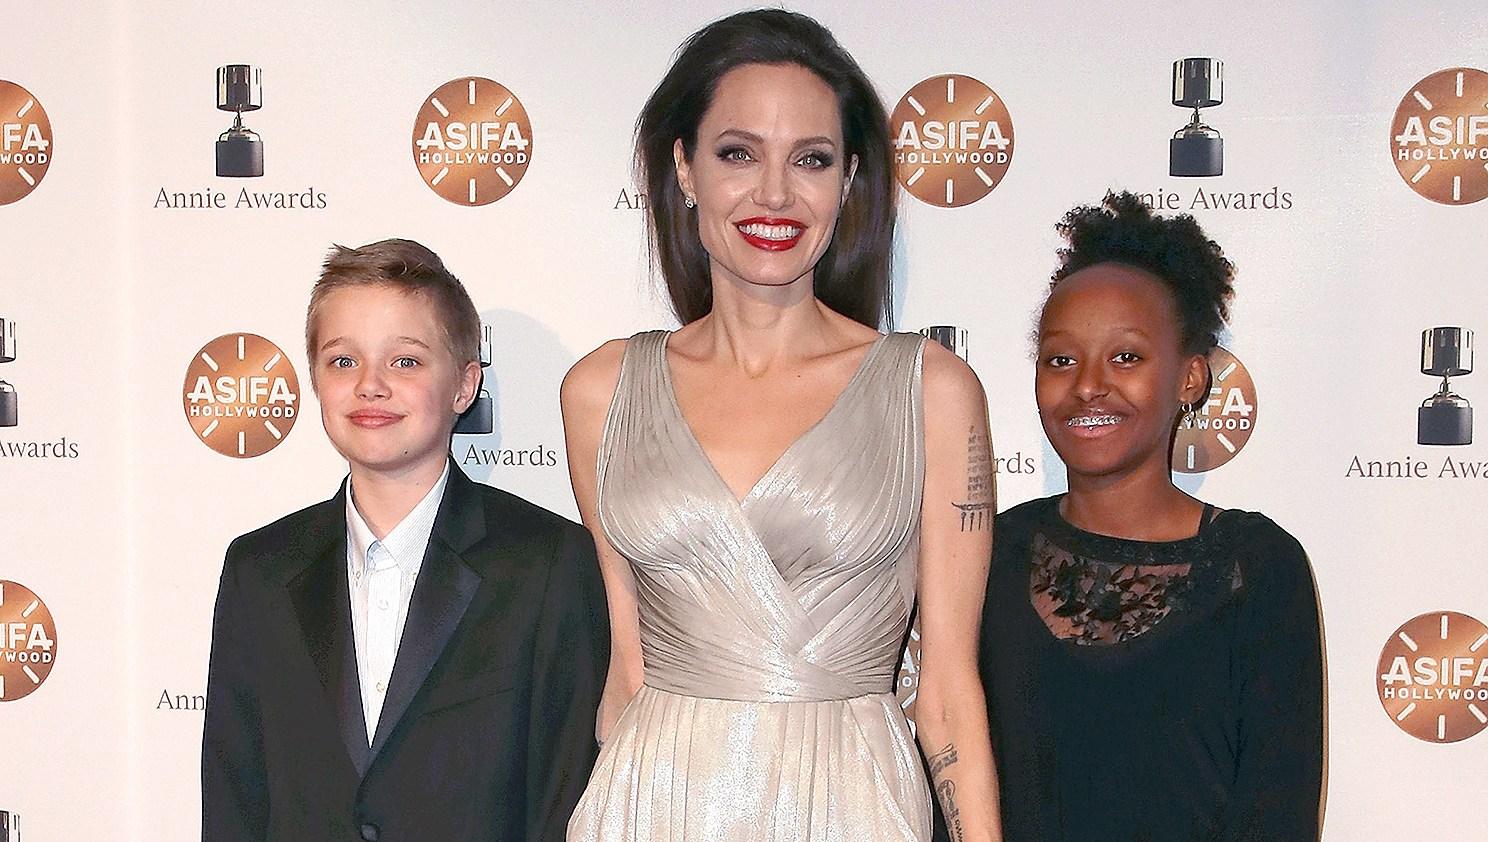 Shiloh Nouvel Jolie-Pitt, Angelina Jolie, Zahara Marley Jolie-Pitt, 45th Annual Annie Awards